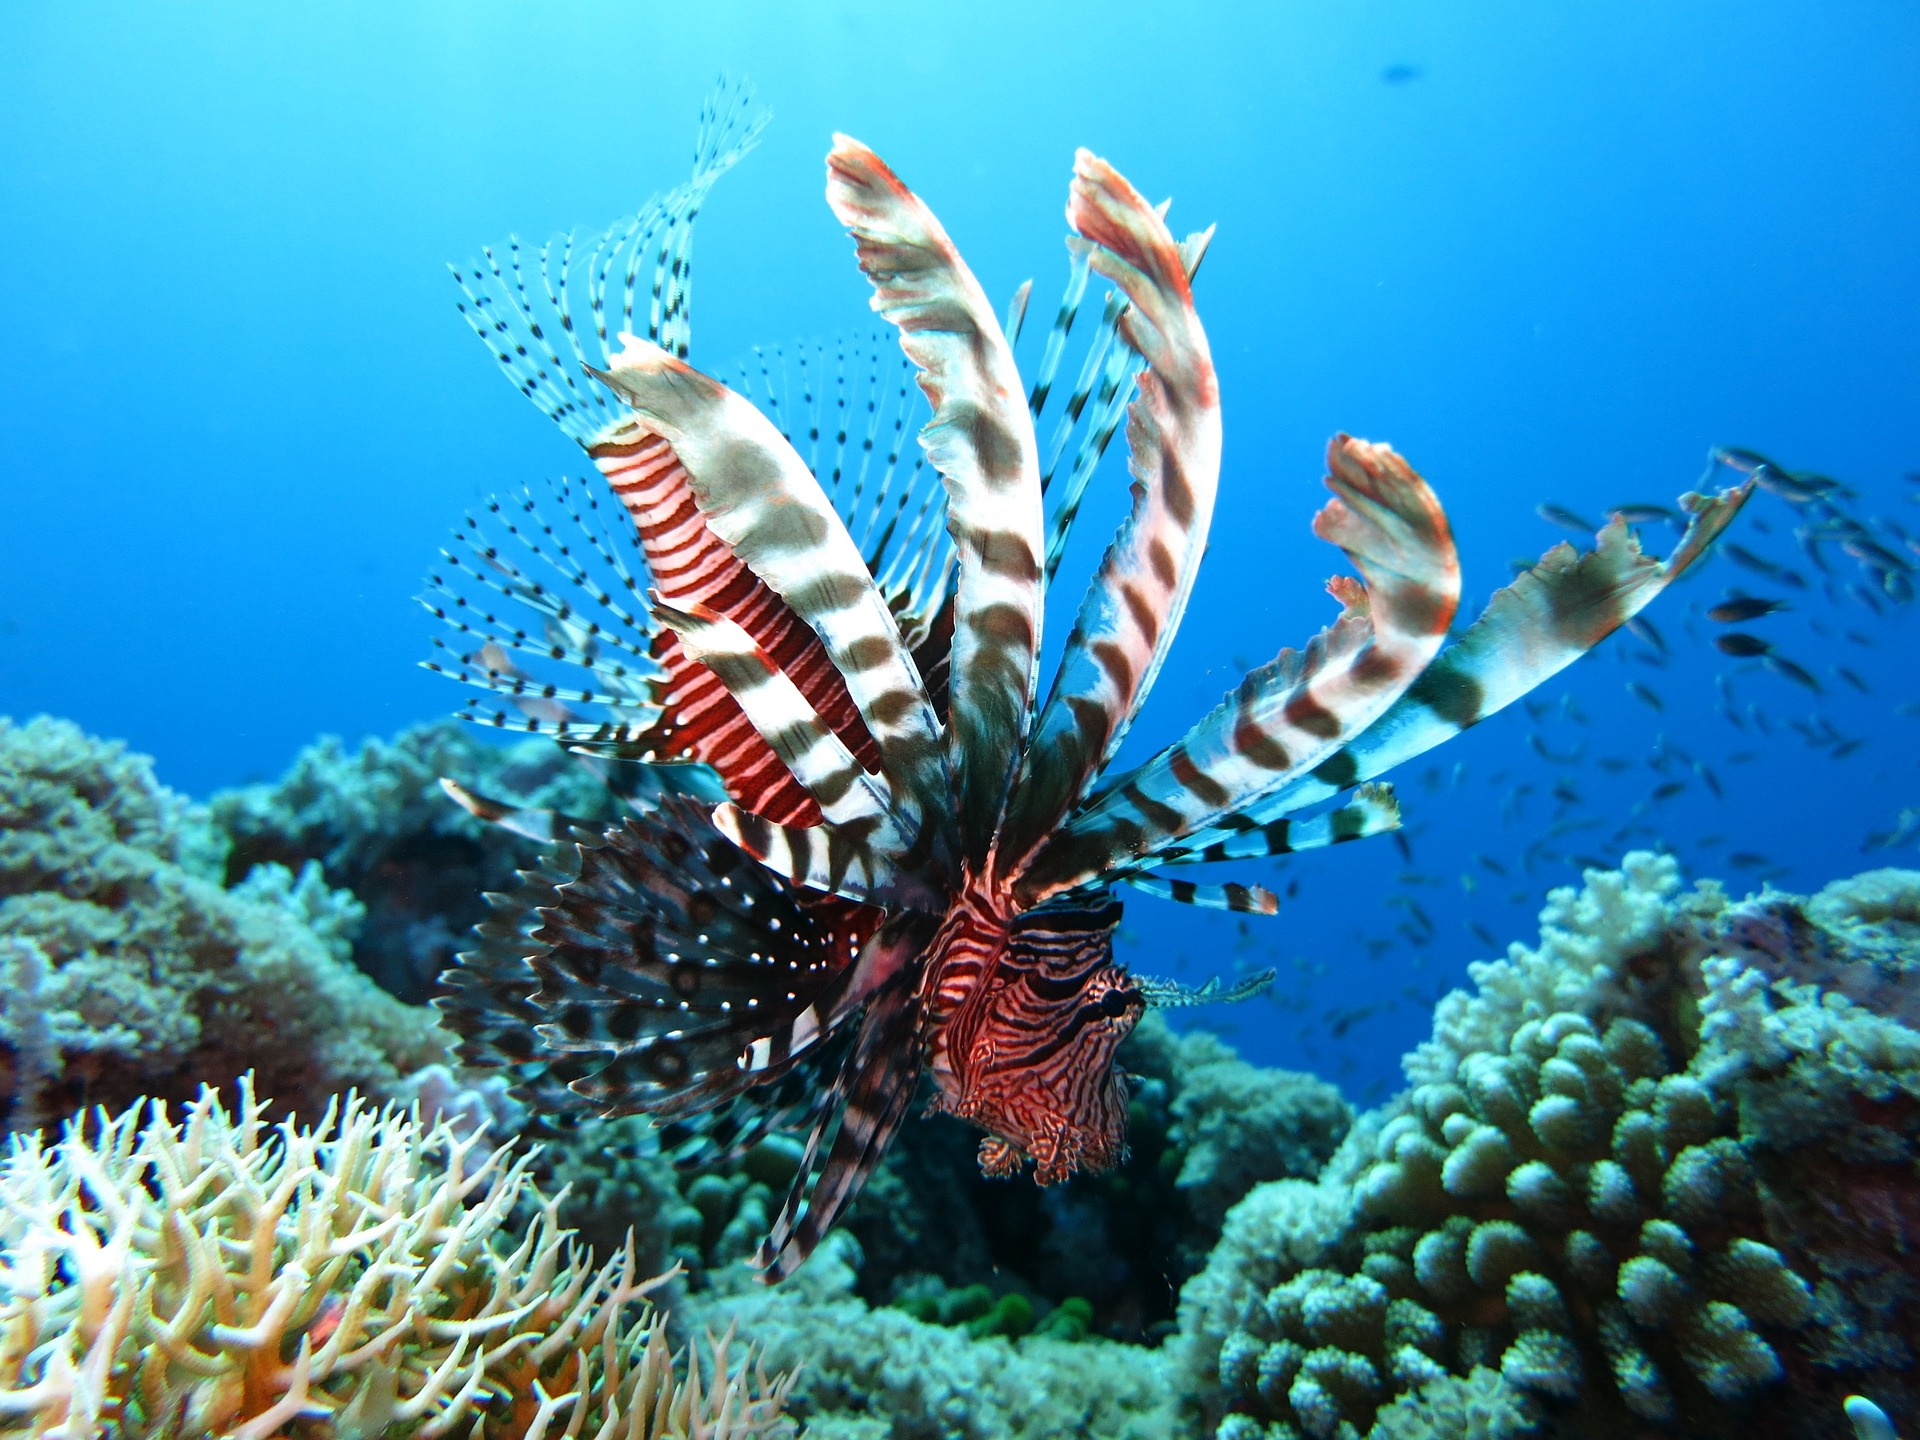 lionfish-1430225_1920.jpg